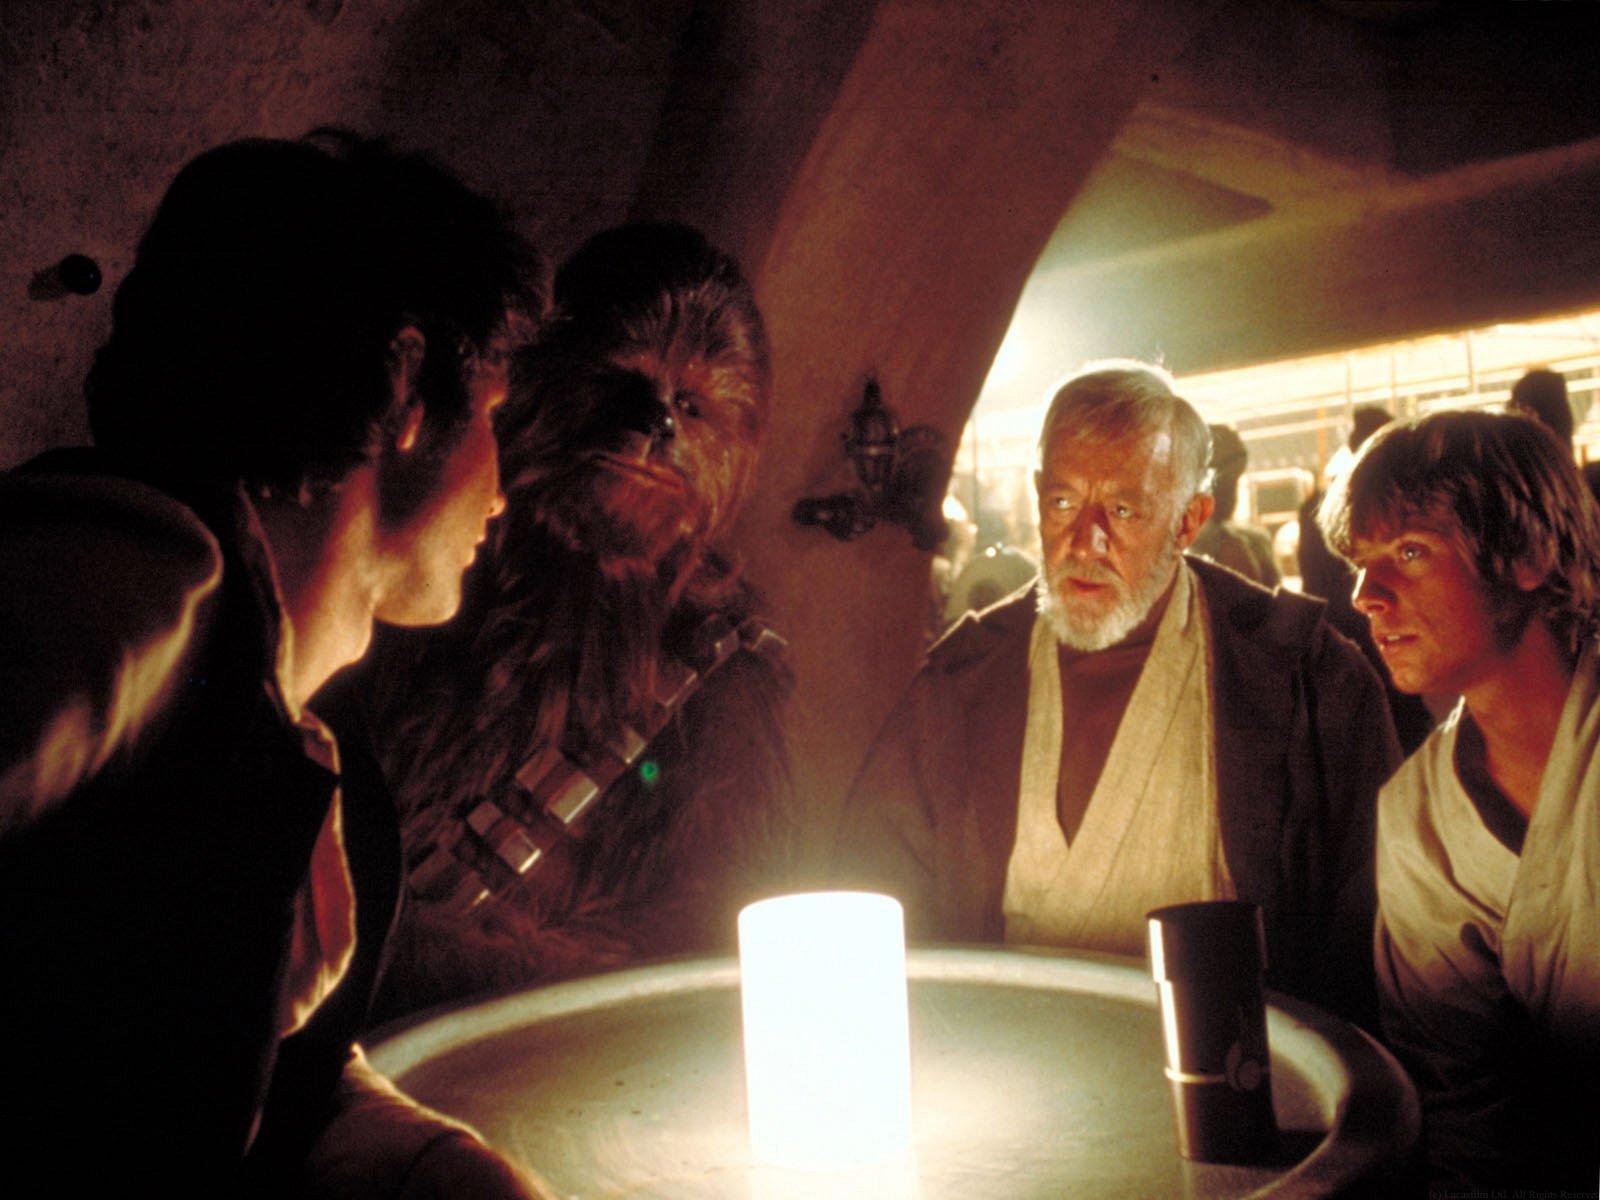 Star Wars Movies Luke Skywalker Han Solo Chewbacca Harrison Ford Mark Hamill Obi Wan Kenobi Wallpaper 1600x1200 292838 Wallpaperup